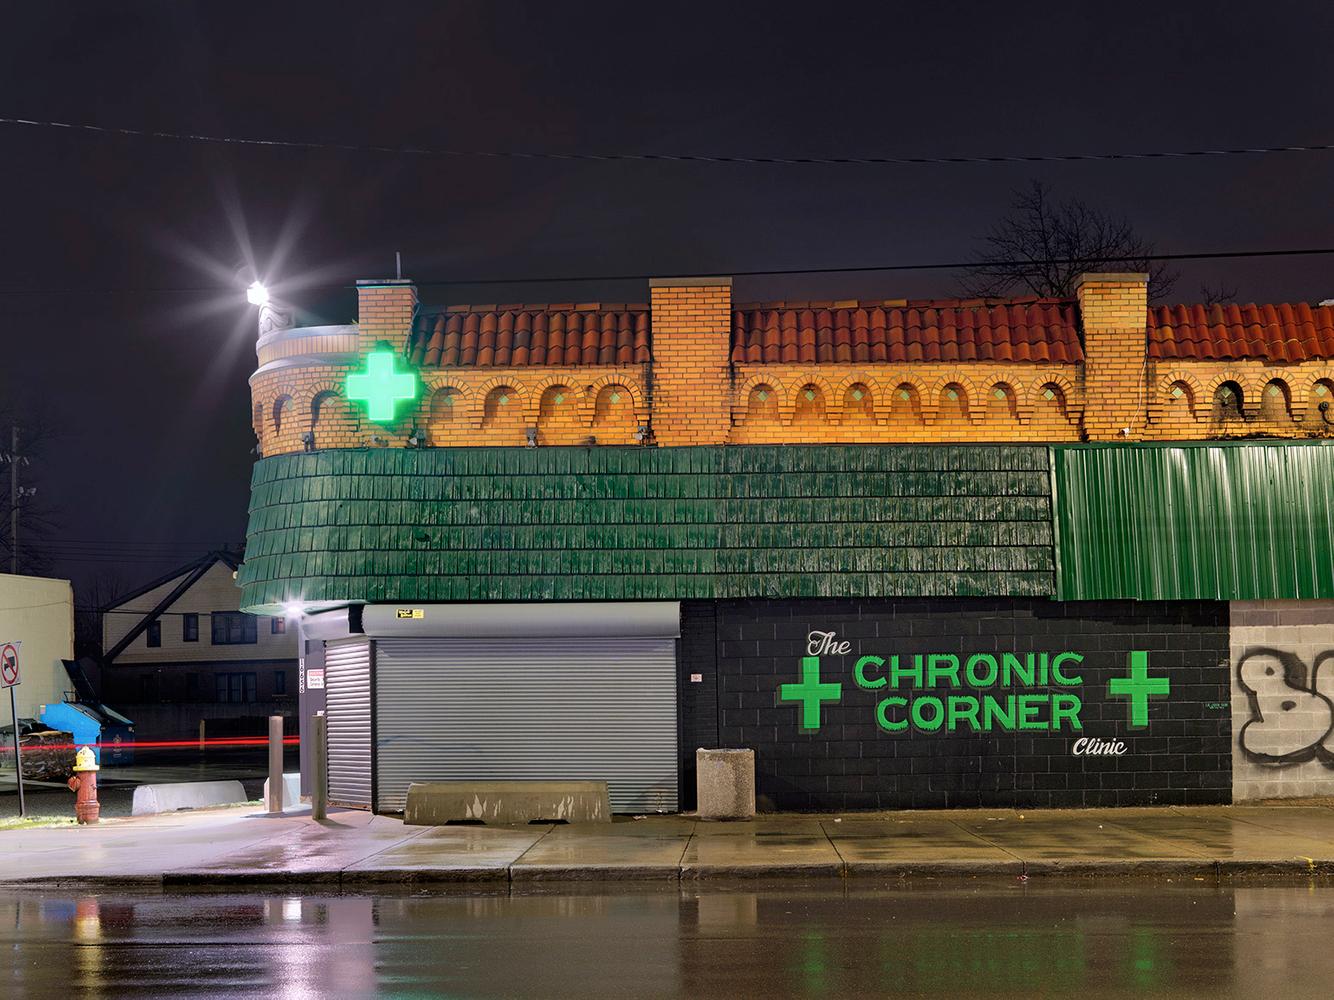 Medical Marijuana Dispensary #24, Eastside, Detroit 2016